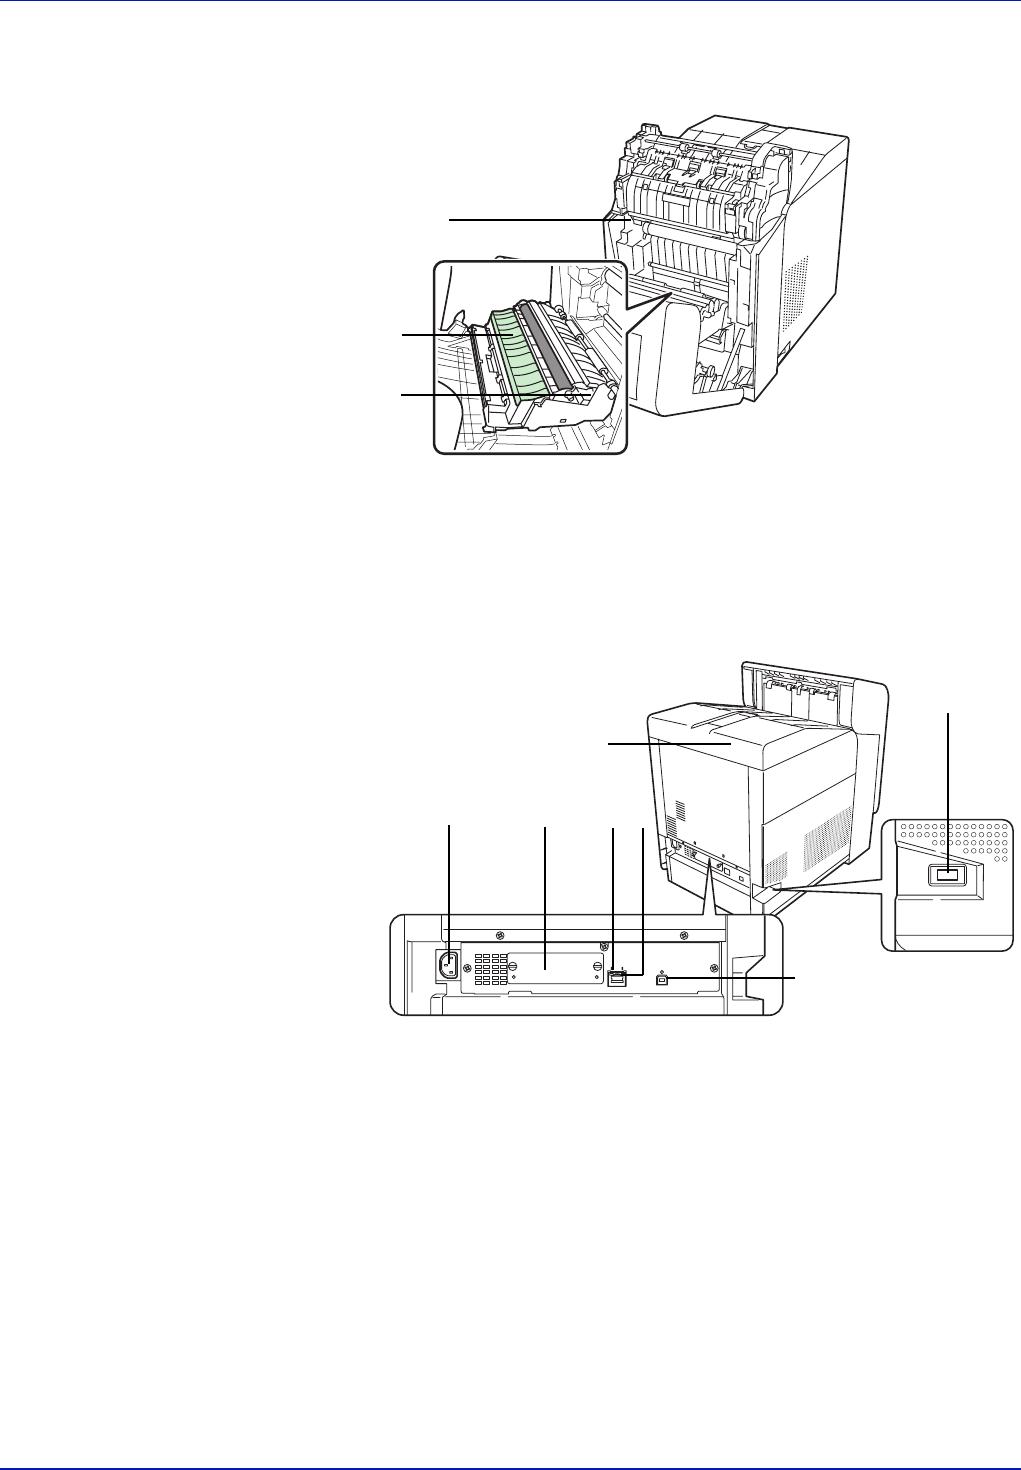 Kyocera FS-1100, FS-1300D, FS-C5400DN Internal Components